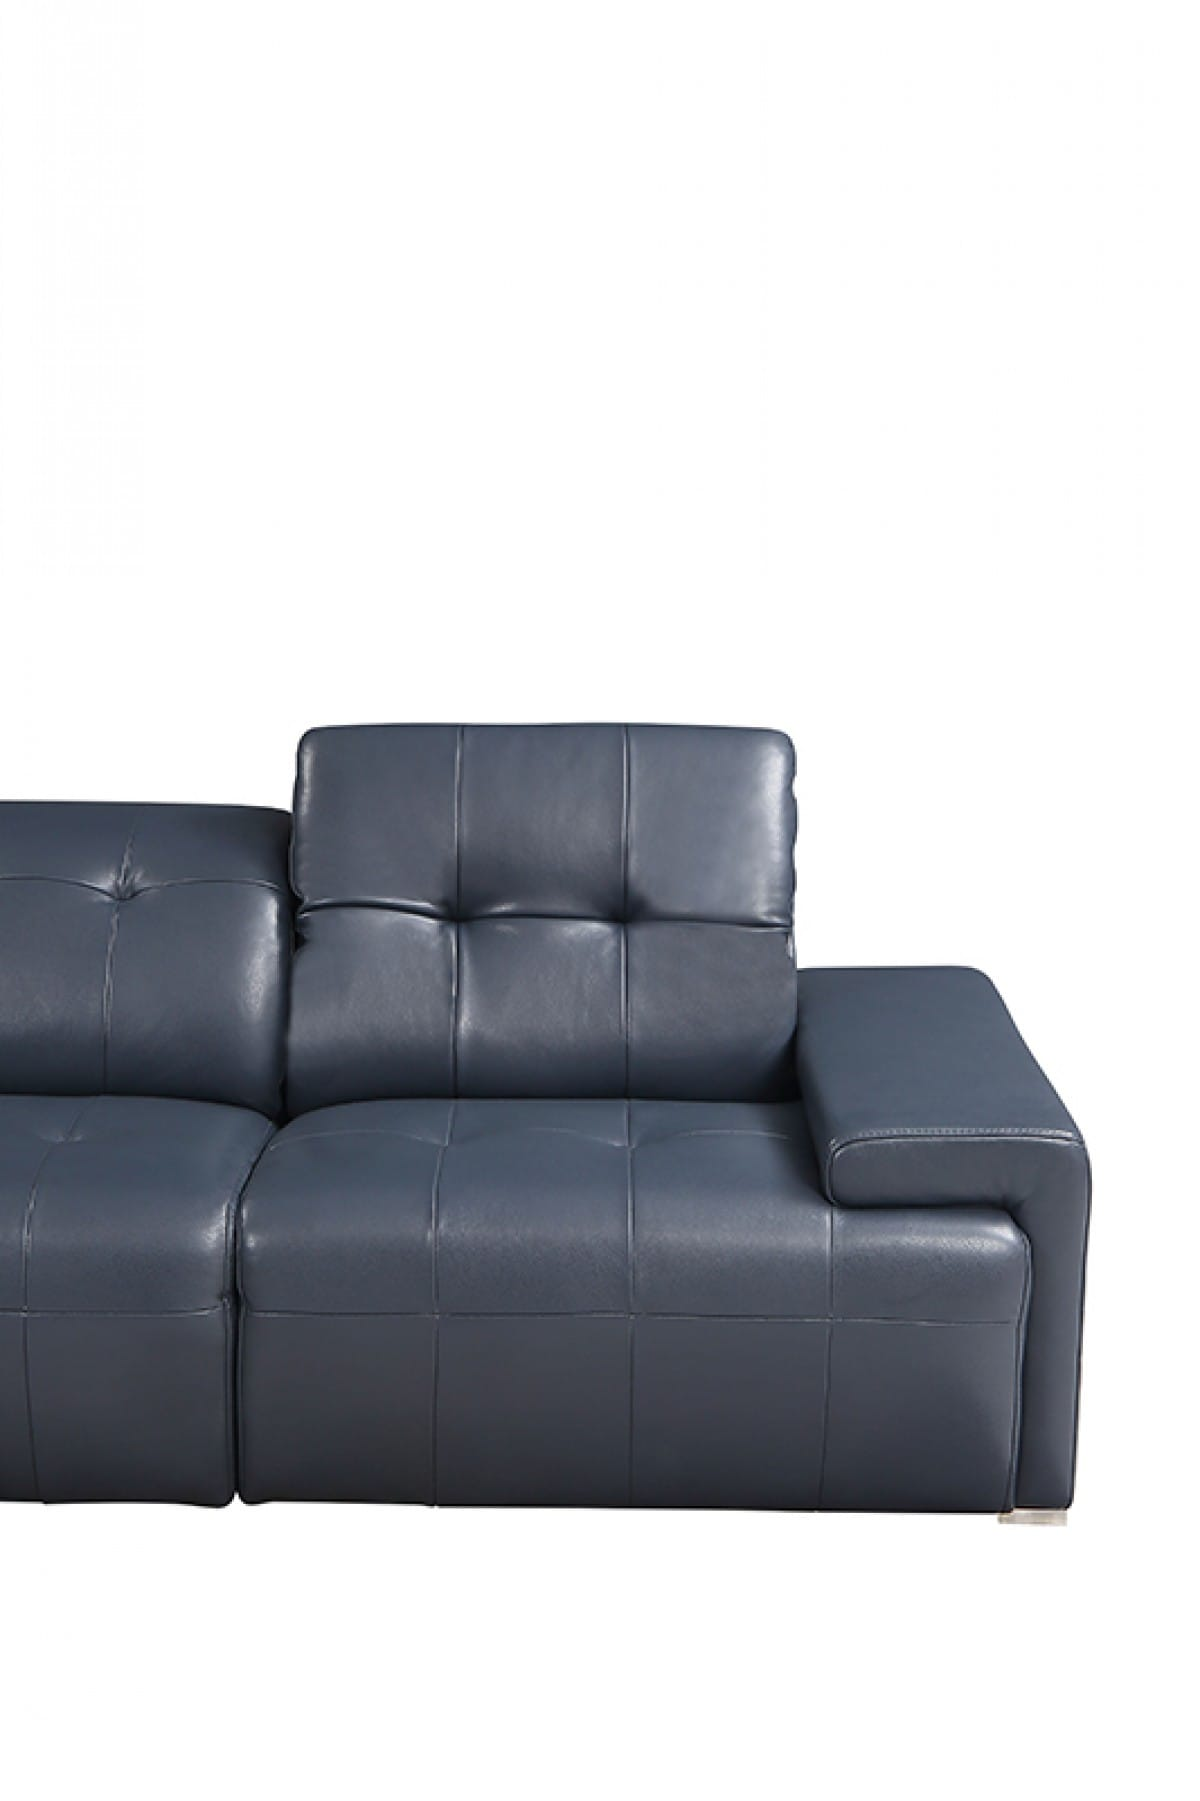 Divani Casa Grafton Modern Blue Leather Sectional Sofa by VIG Furniture